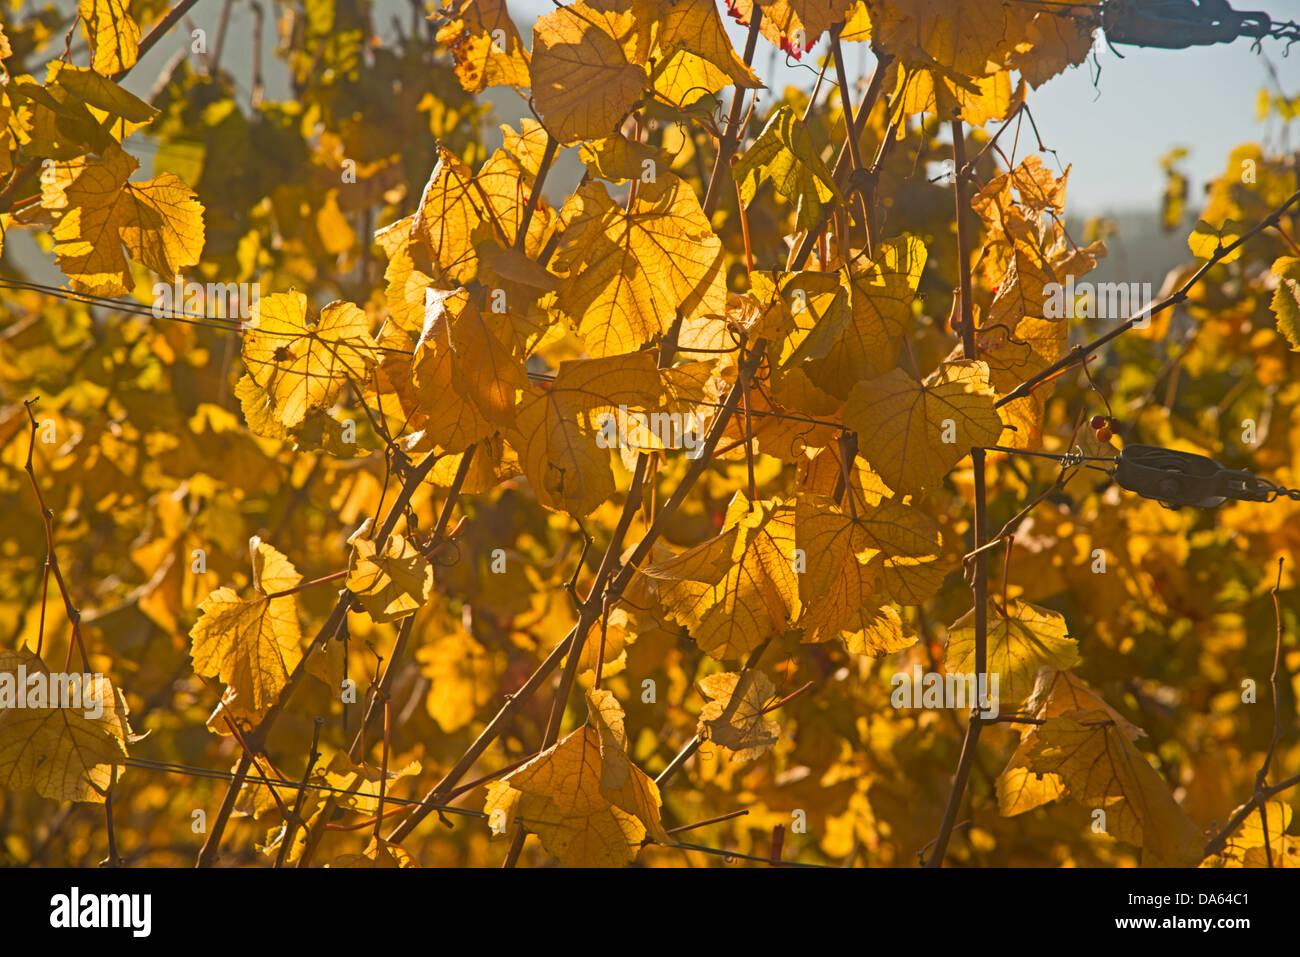 Wine village, Dernau, Ahr, vineyards, Ahrtal, red wine, late Burgundian, Portugieser, wine, wine-growing, Eifel, Stock Photo